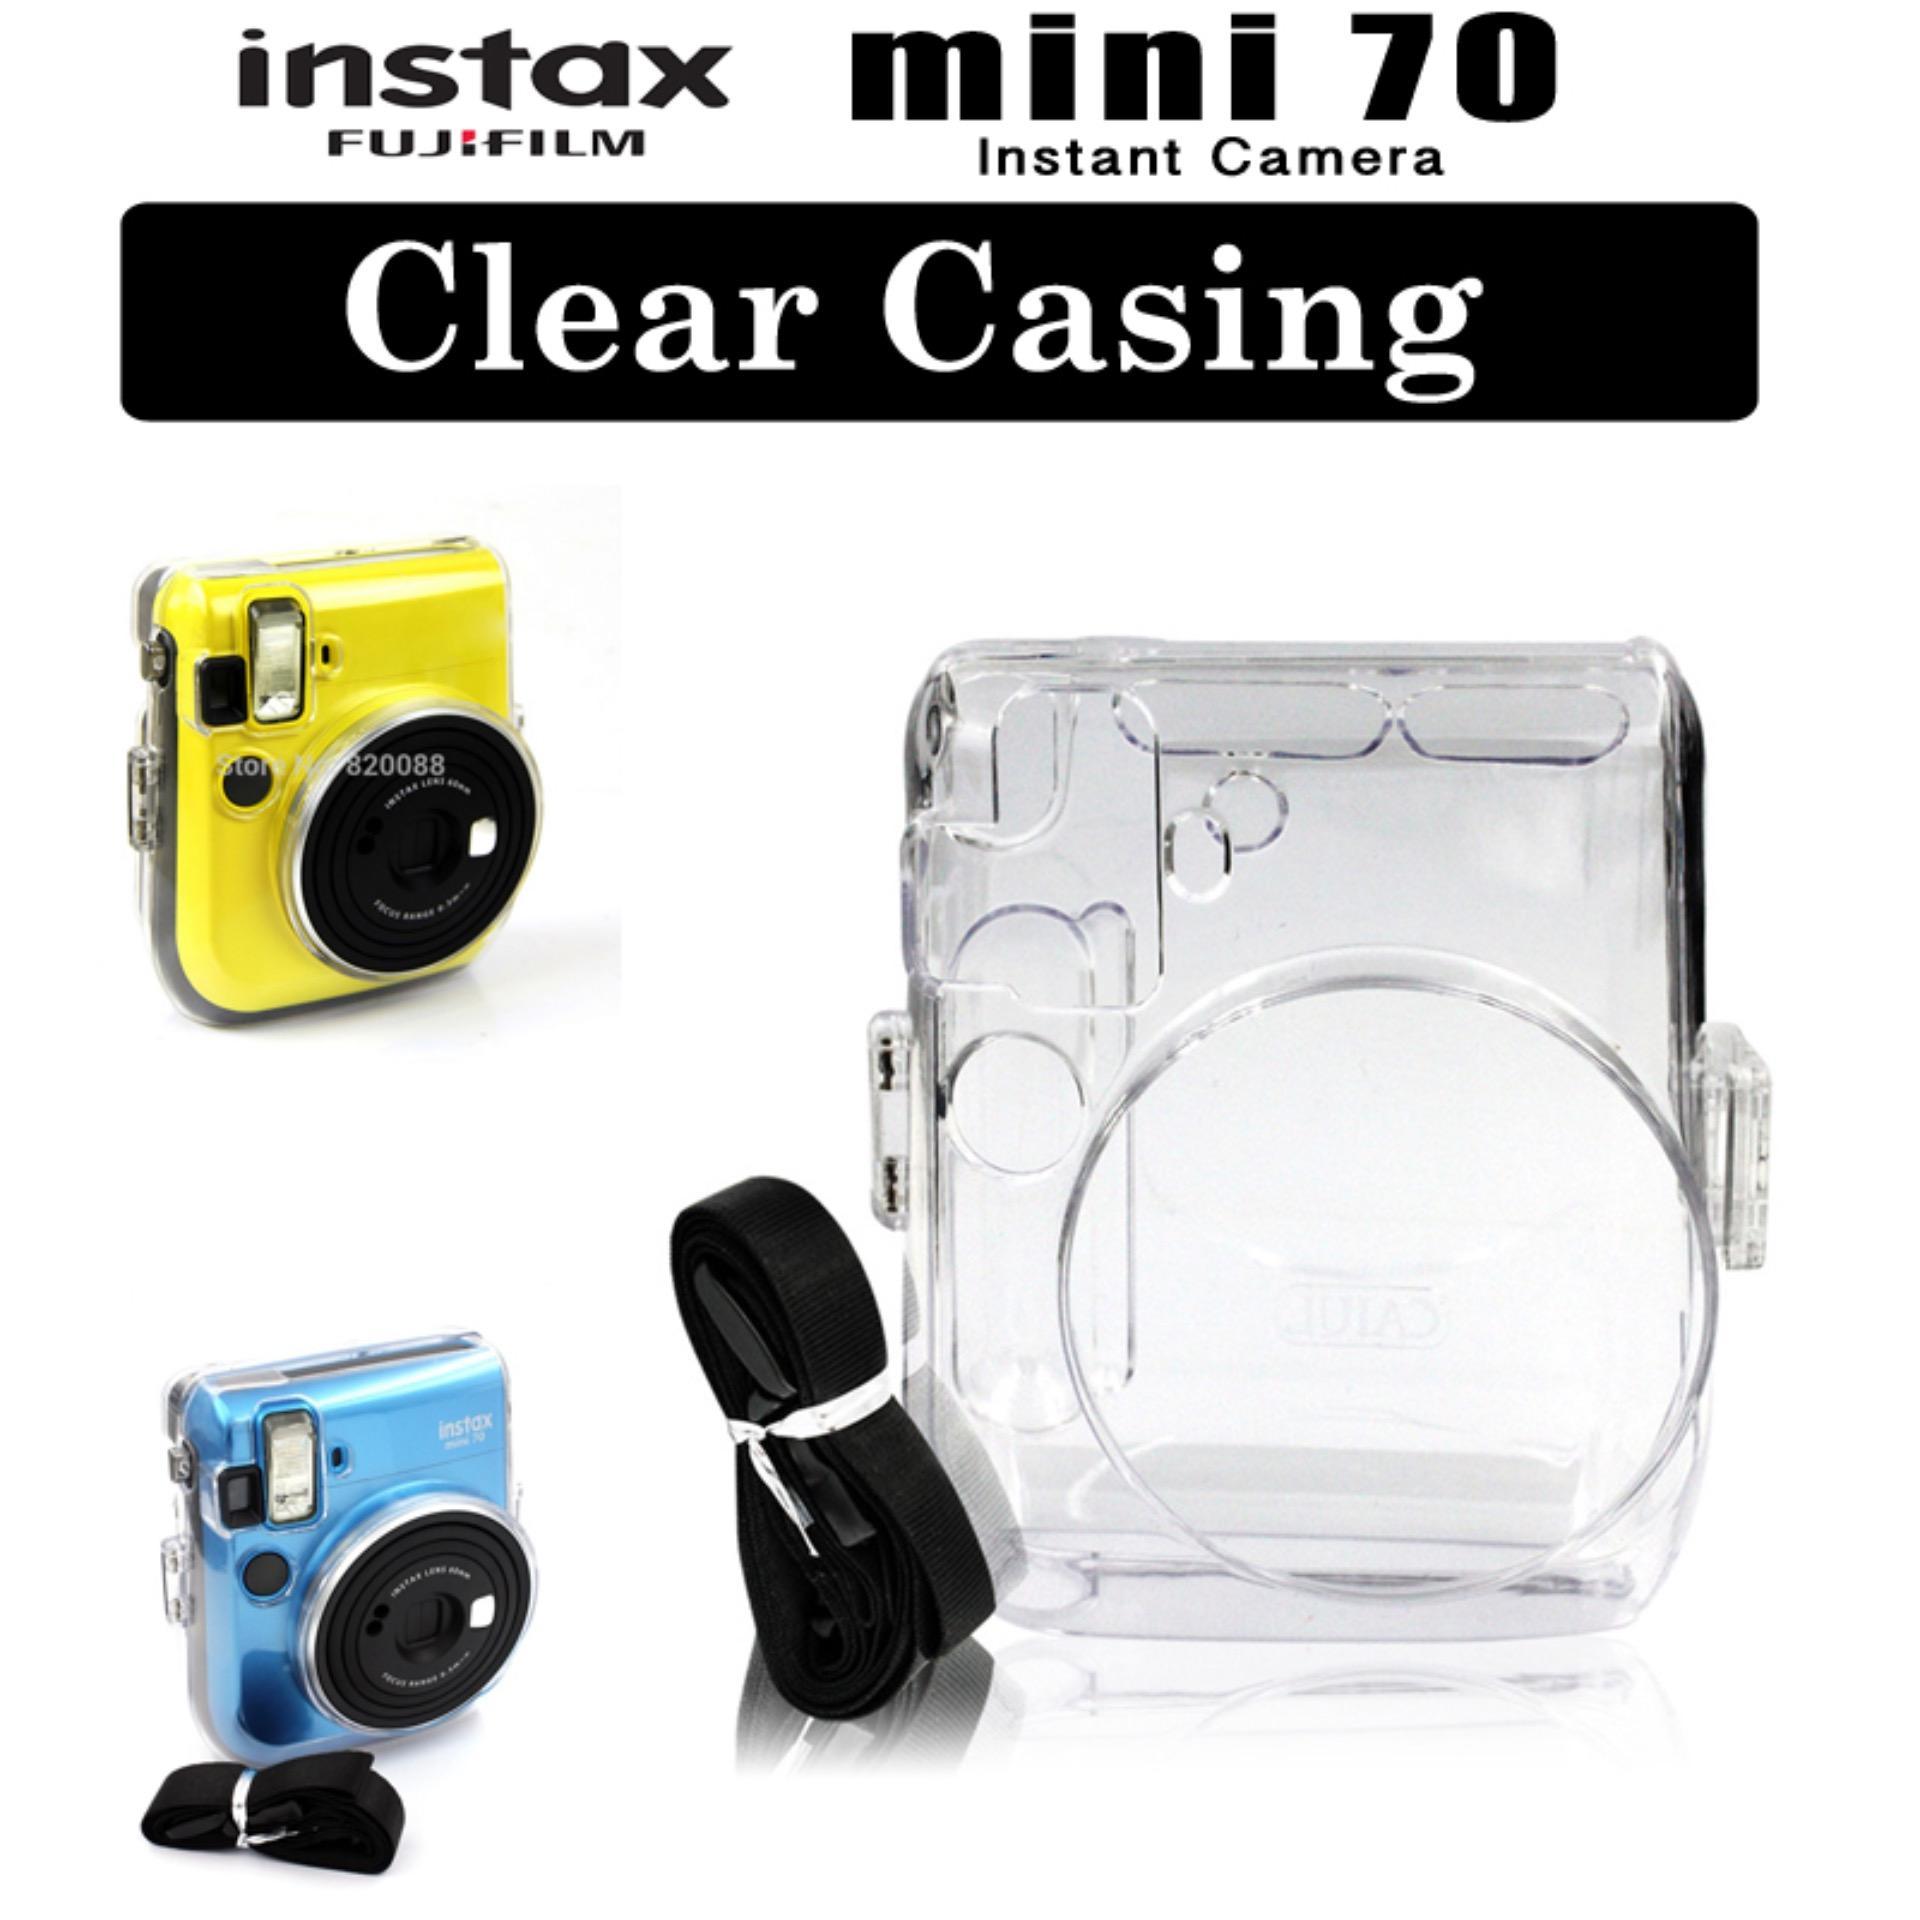 Fujifilm Instax Mini 70 Instant Camera Crystal Clear Casing